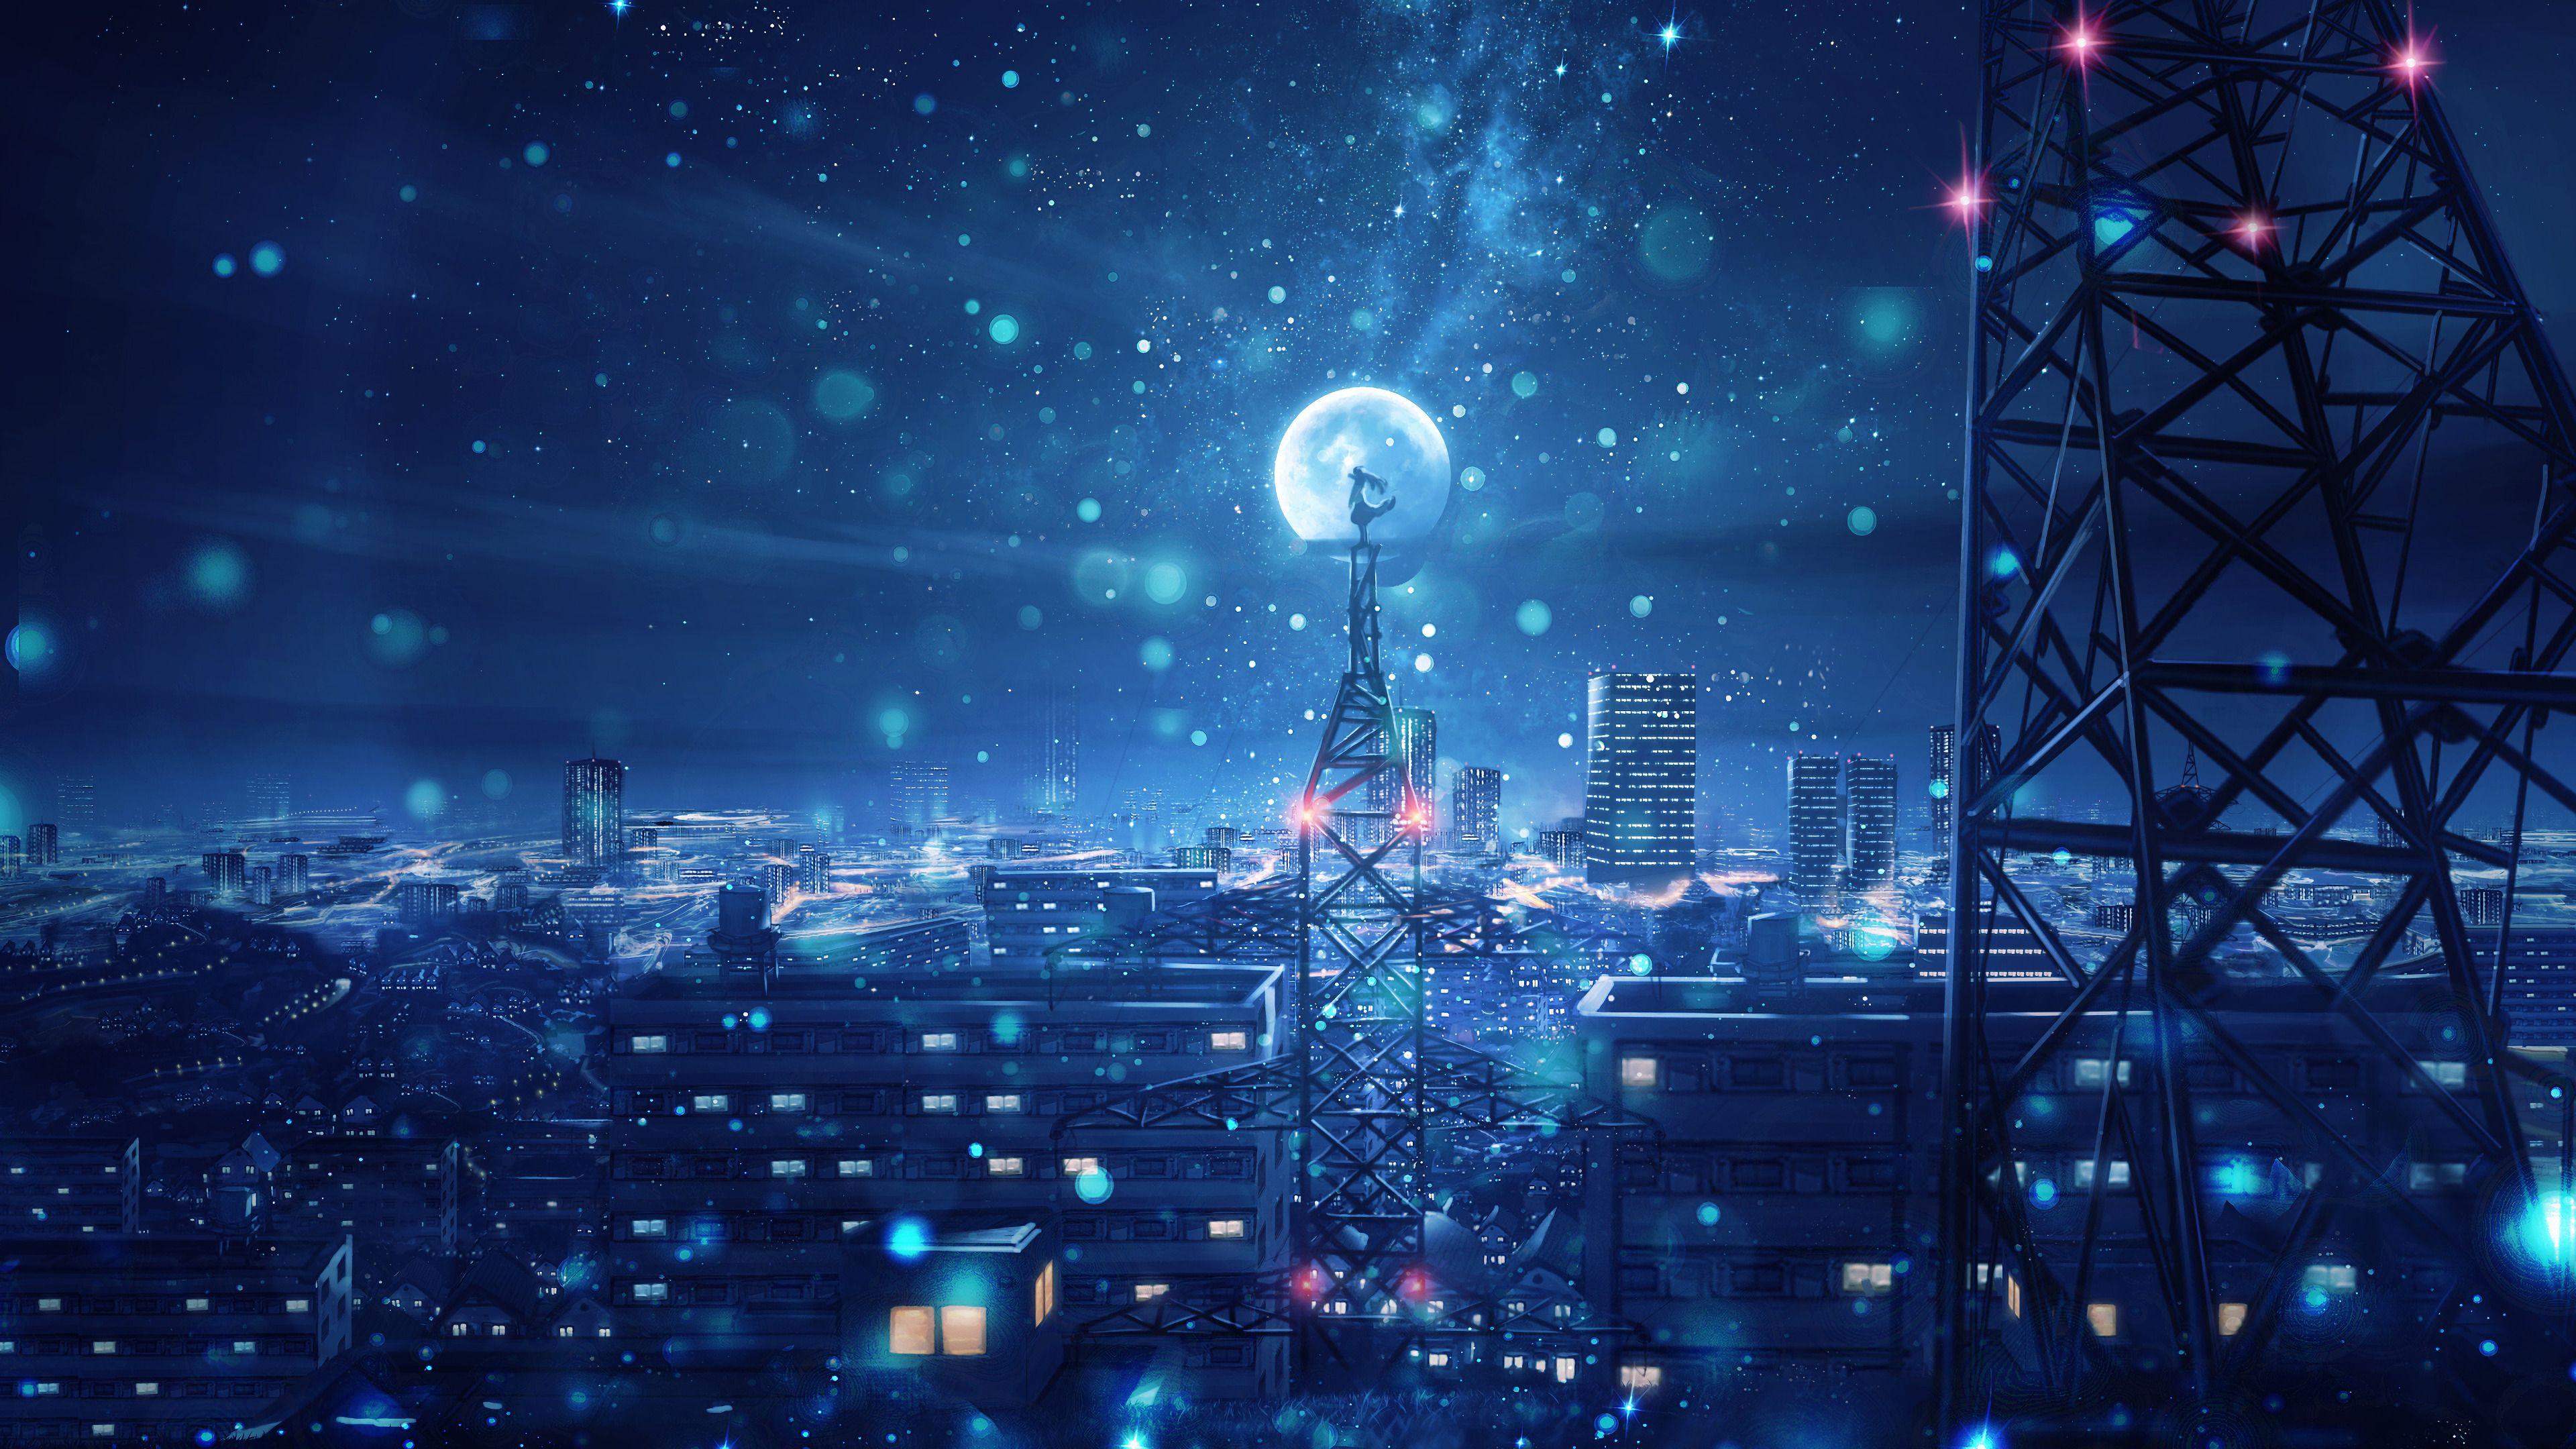 Anime Night Sky City Wallpaper Pc In 2020 Sky Anime Hd Anime Wallpapers Anime Scenery Wallpaper